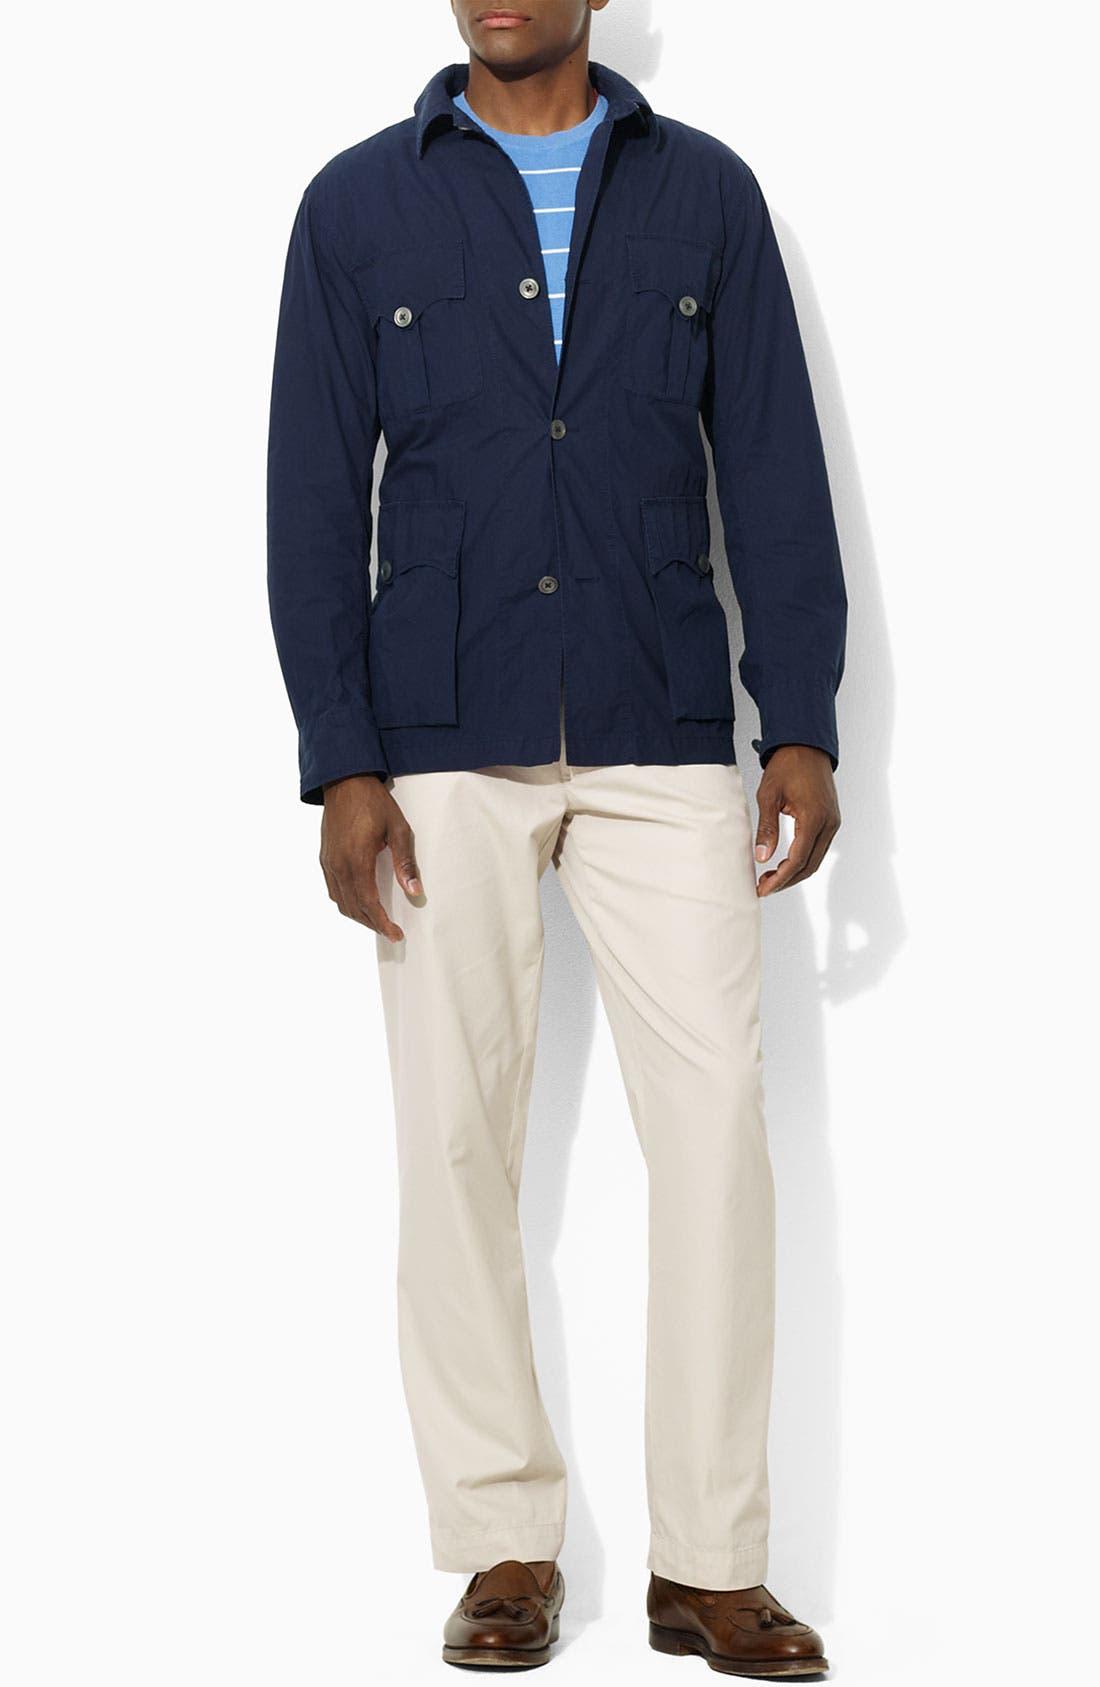 Main Image - Polo Ralph Lauren Cotton Poplin Safari Jacket